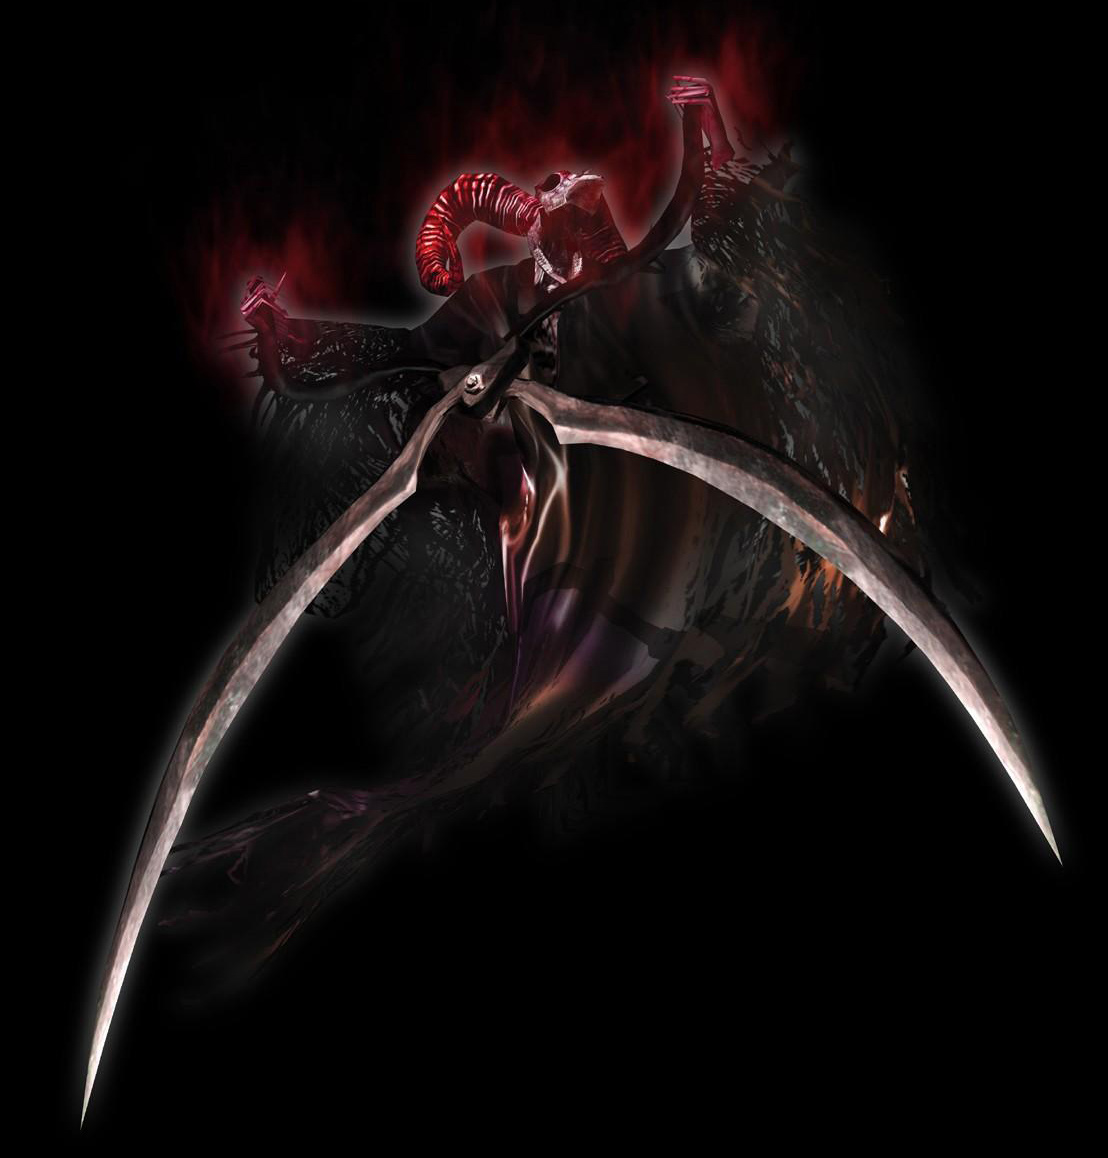 Image dante devil trigger dmc jpg devil may cry wiki fandom - Death Scissors Jpg